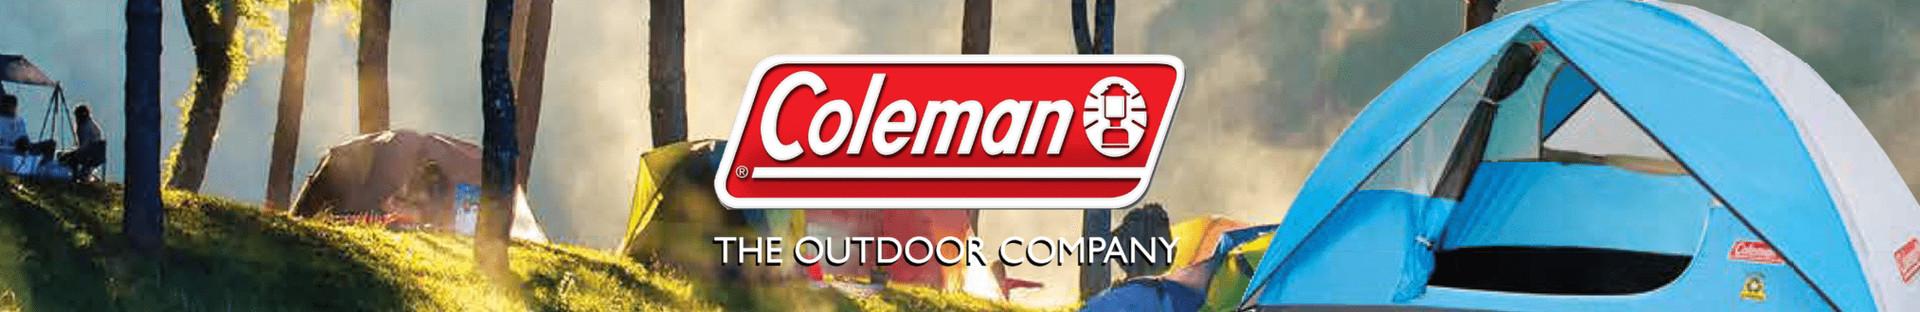 Coleman Indonesia